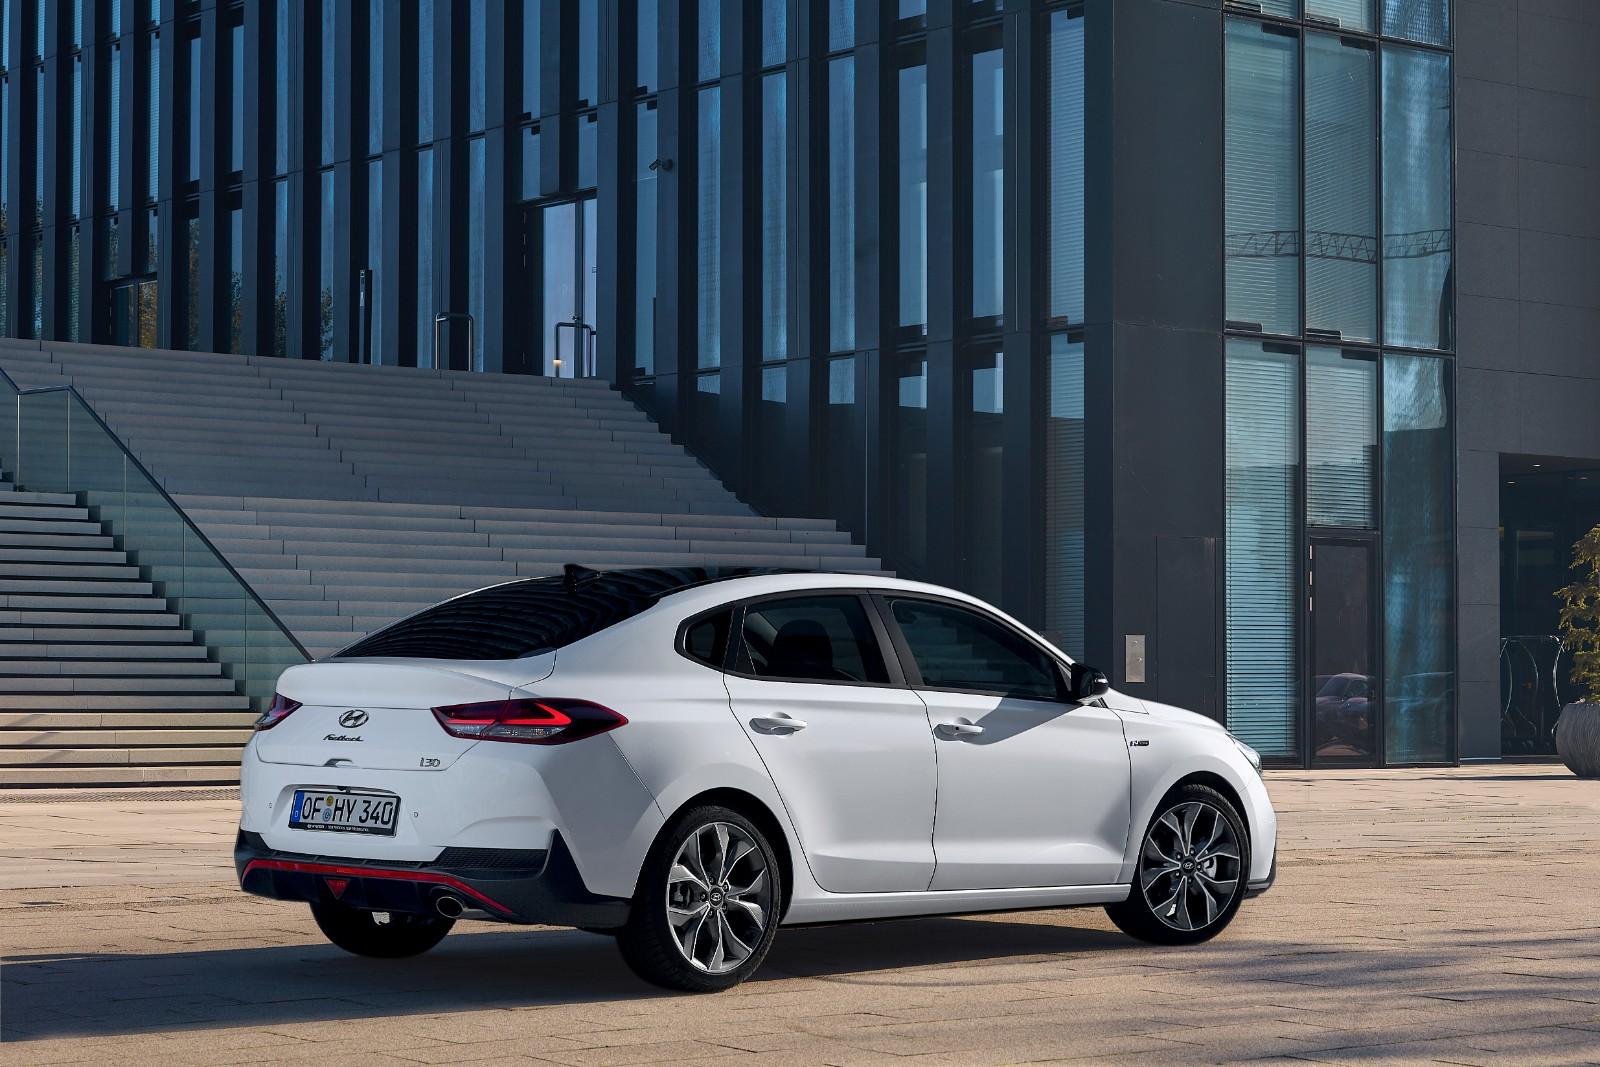 2017 - [Hyundai] i30 Fastback - Page 3 934267l